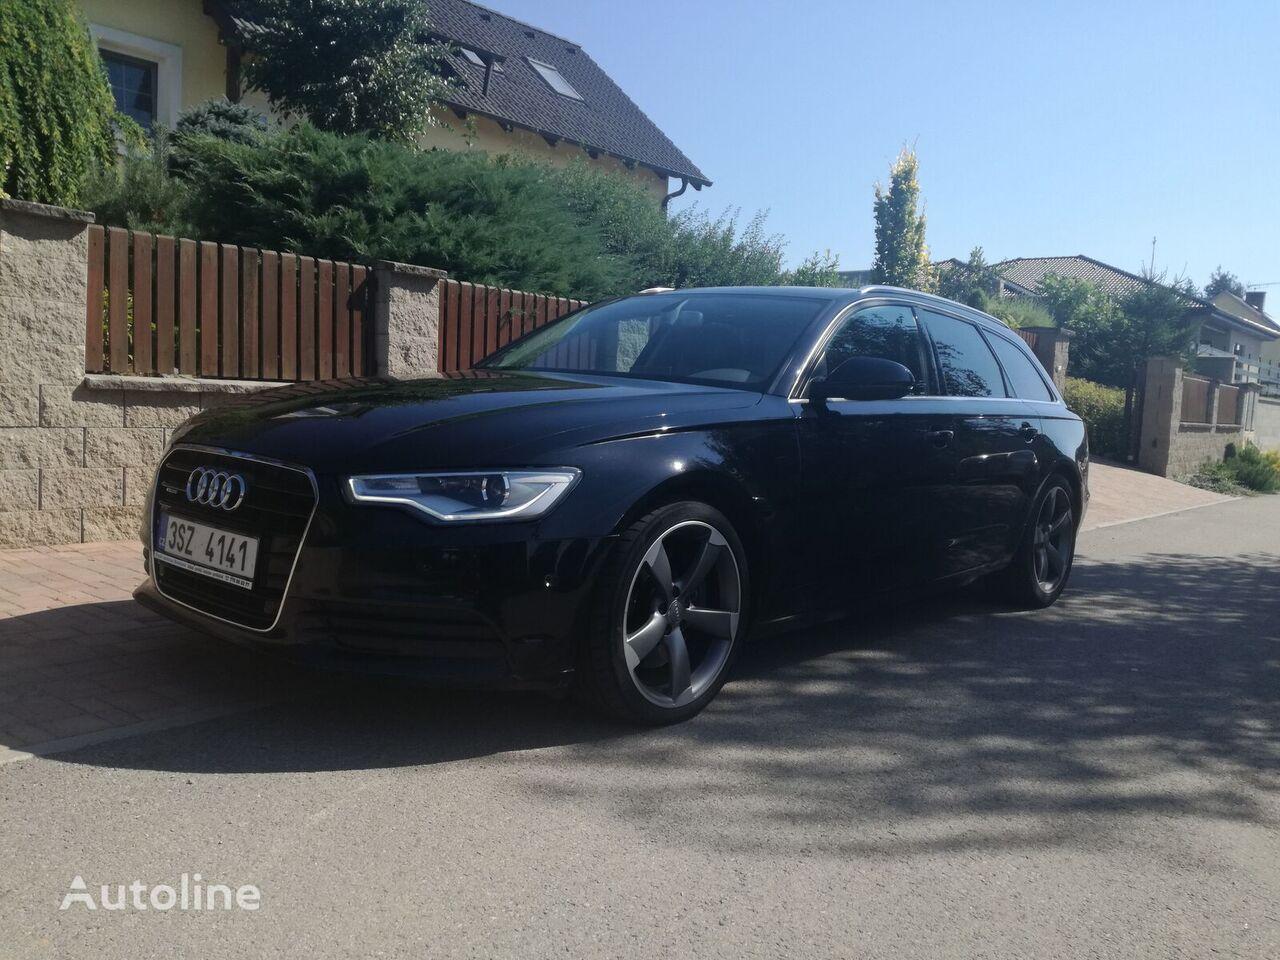 Audi A6 Avant 3.0 TDi Quattro panorama estate car